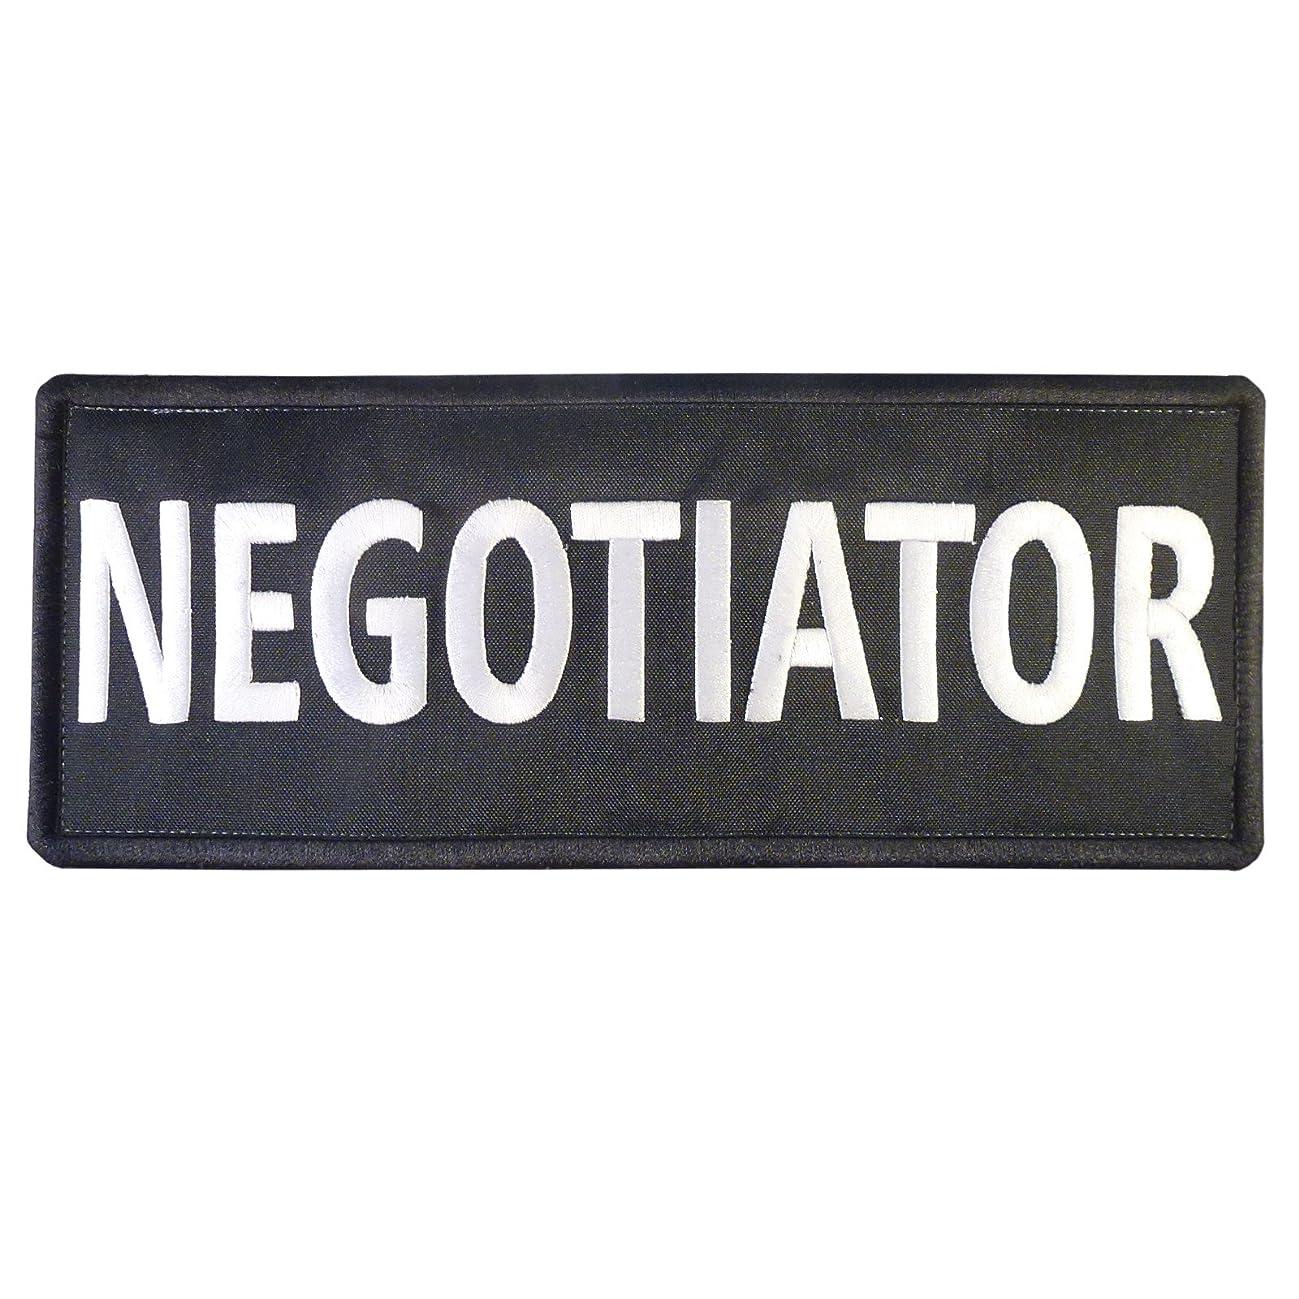 LEGEEON Negotiator Big XL 10x4 inch SWAT Vest Tactical Embroidered Nylon Hook&Loop Patch